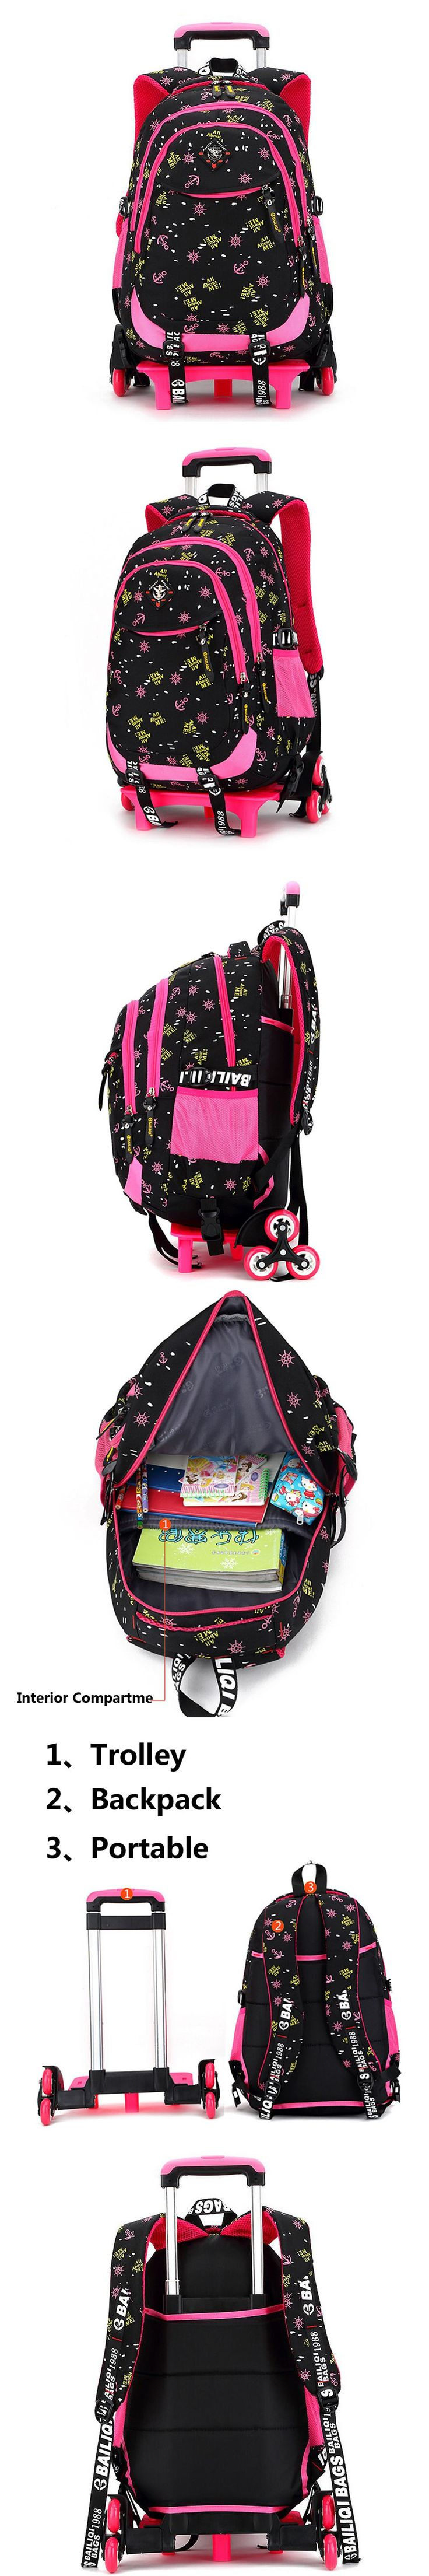 School bag with wheels singapore - Trolley School Bag For Girls 2 Wheels 3wheels Backpack Children Travel Bag Rolling Luggage Schoolbag